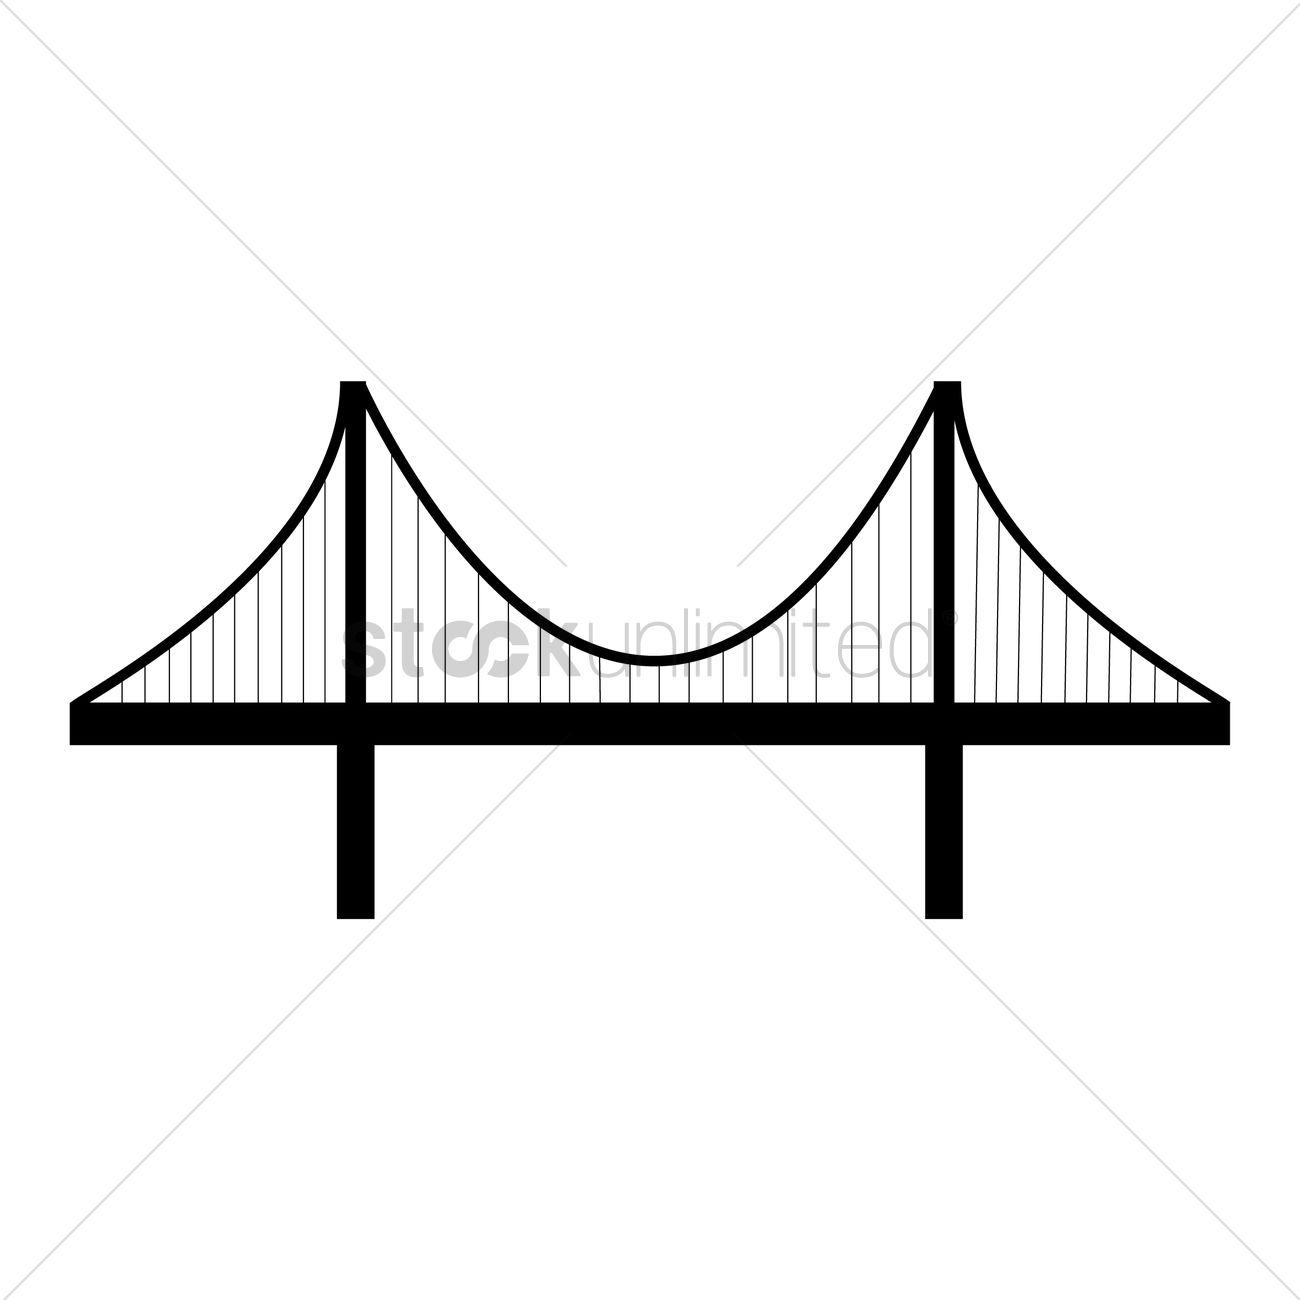 golden gate bridge vector image 1503627 stockunlimited rh stockunlimited com golden gate bridge vector image golden gate bridge silhouette vector